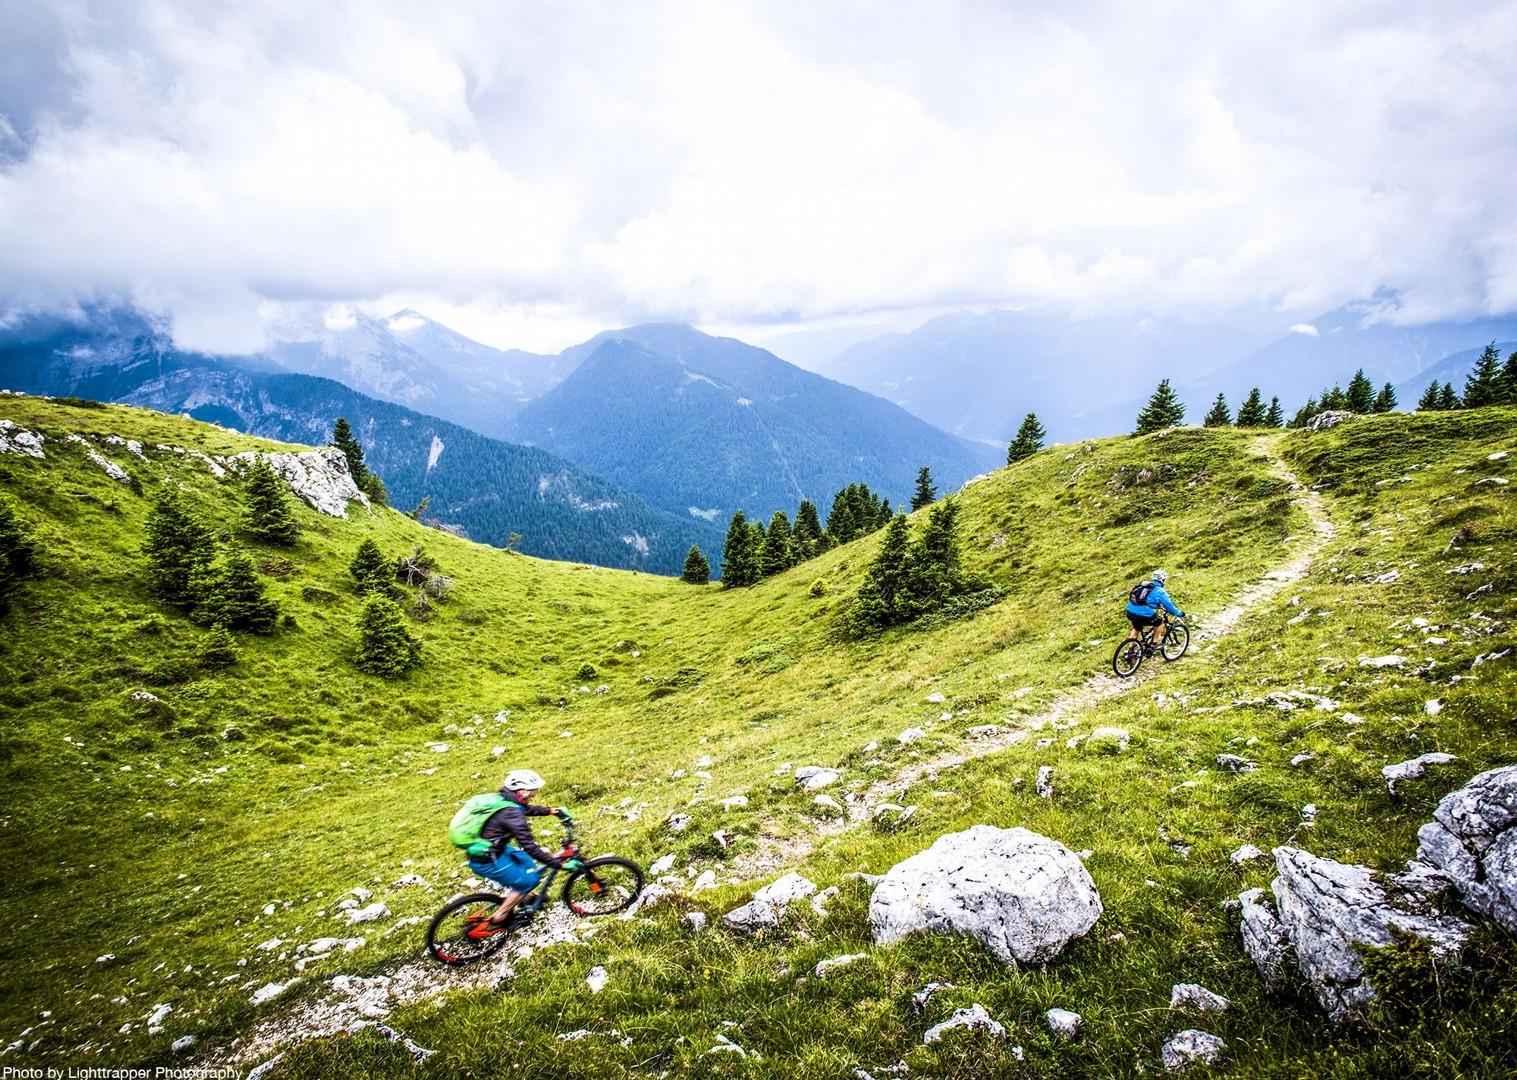 saddle_skedaddle_italy_2017_day6_brenta_dolomites_205-2.jpg - Italy - Dolomites of Brenta - Guided Mountain Bike Holiday - Mountain Biking